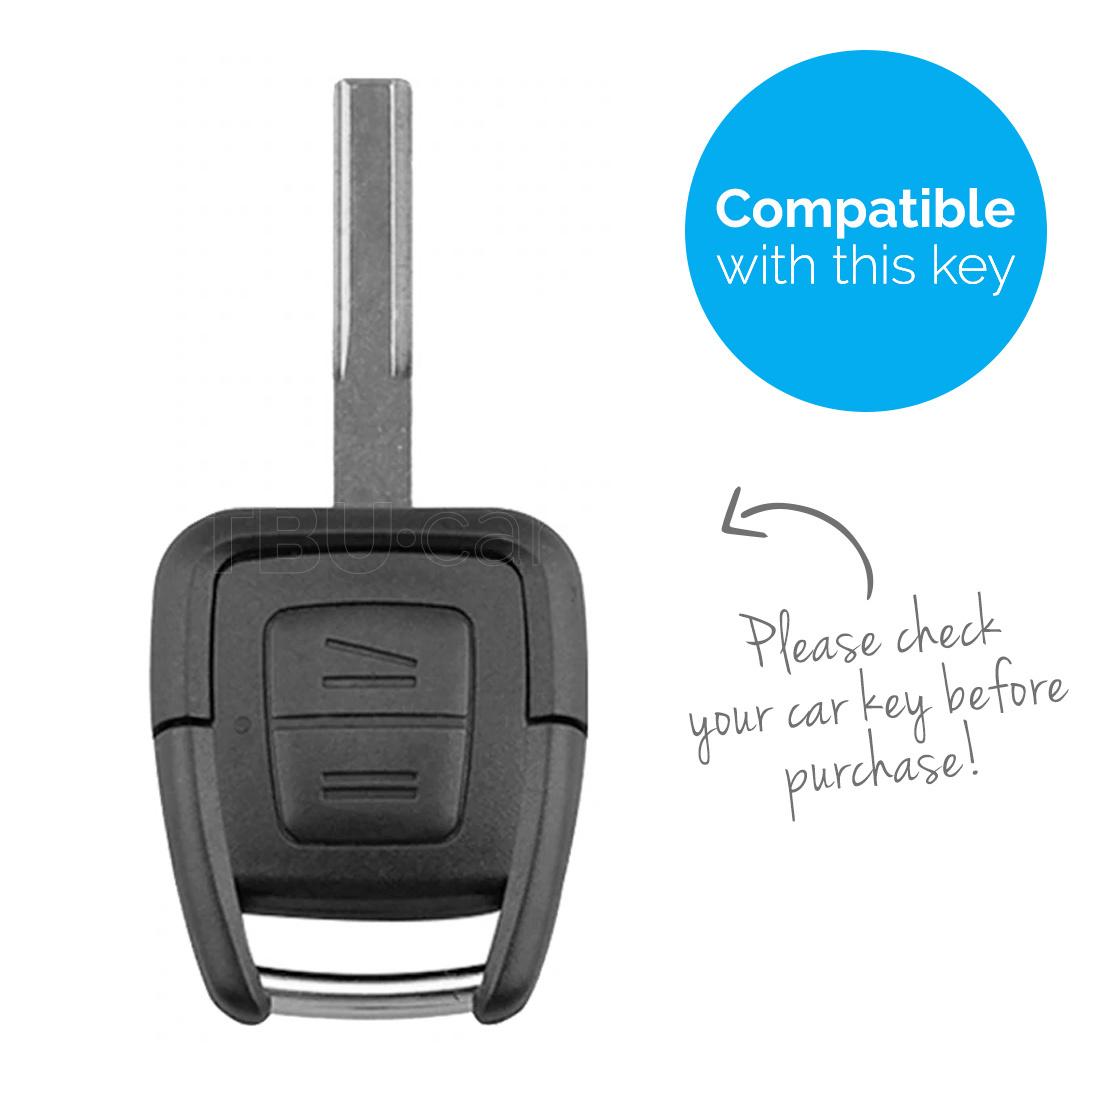 TBU car TBU car Sleutel cover compatibel met Vauxhall - Silicone sleutelhoesje - beschermhoesje autosleutel - Blauw